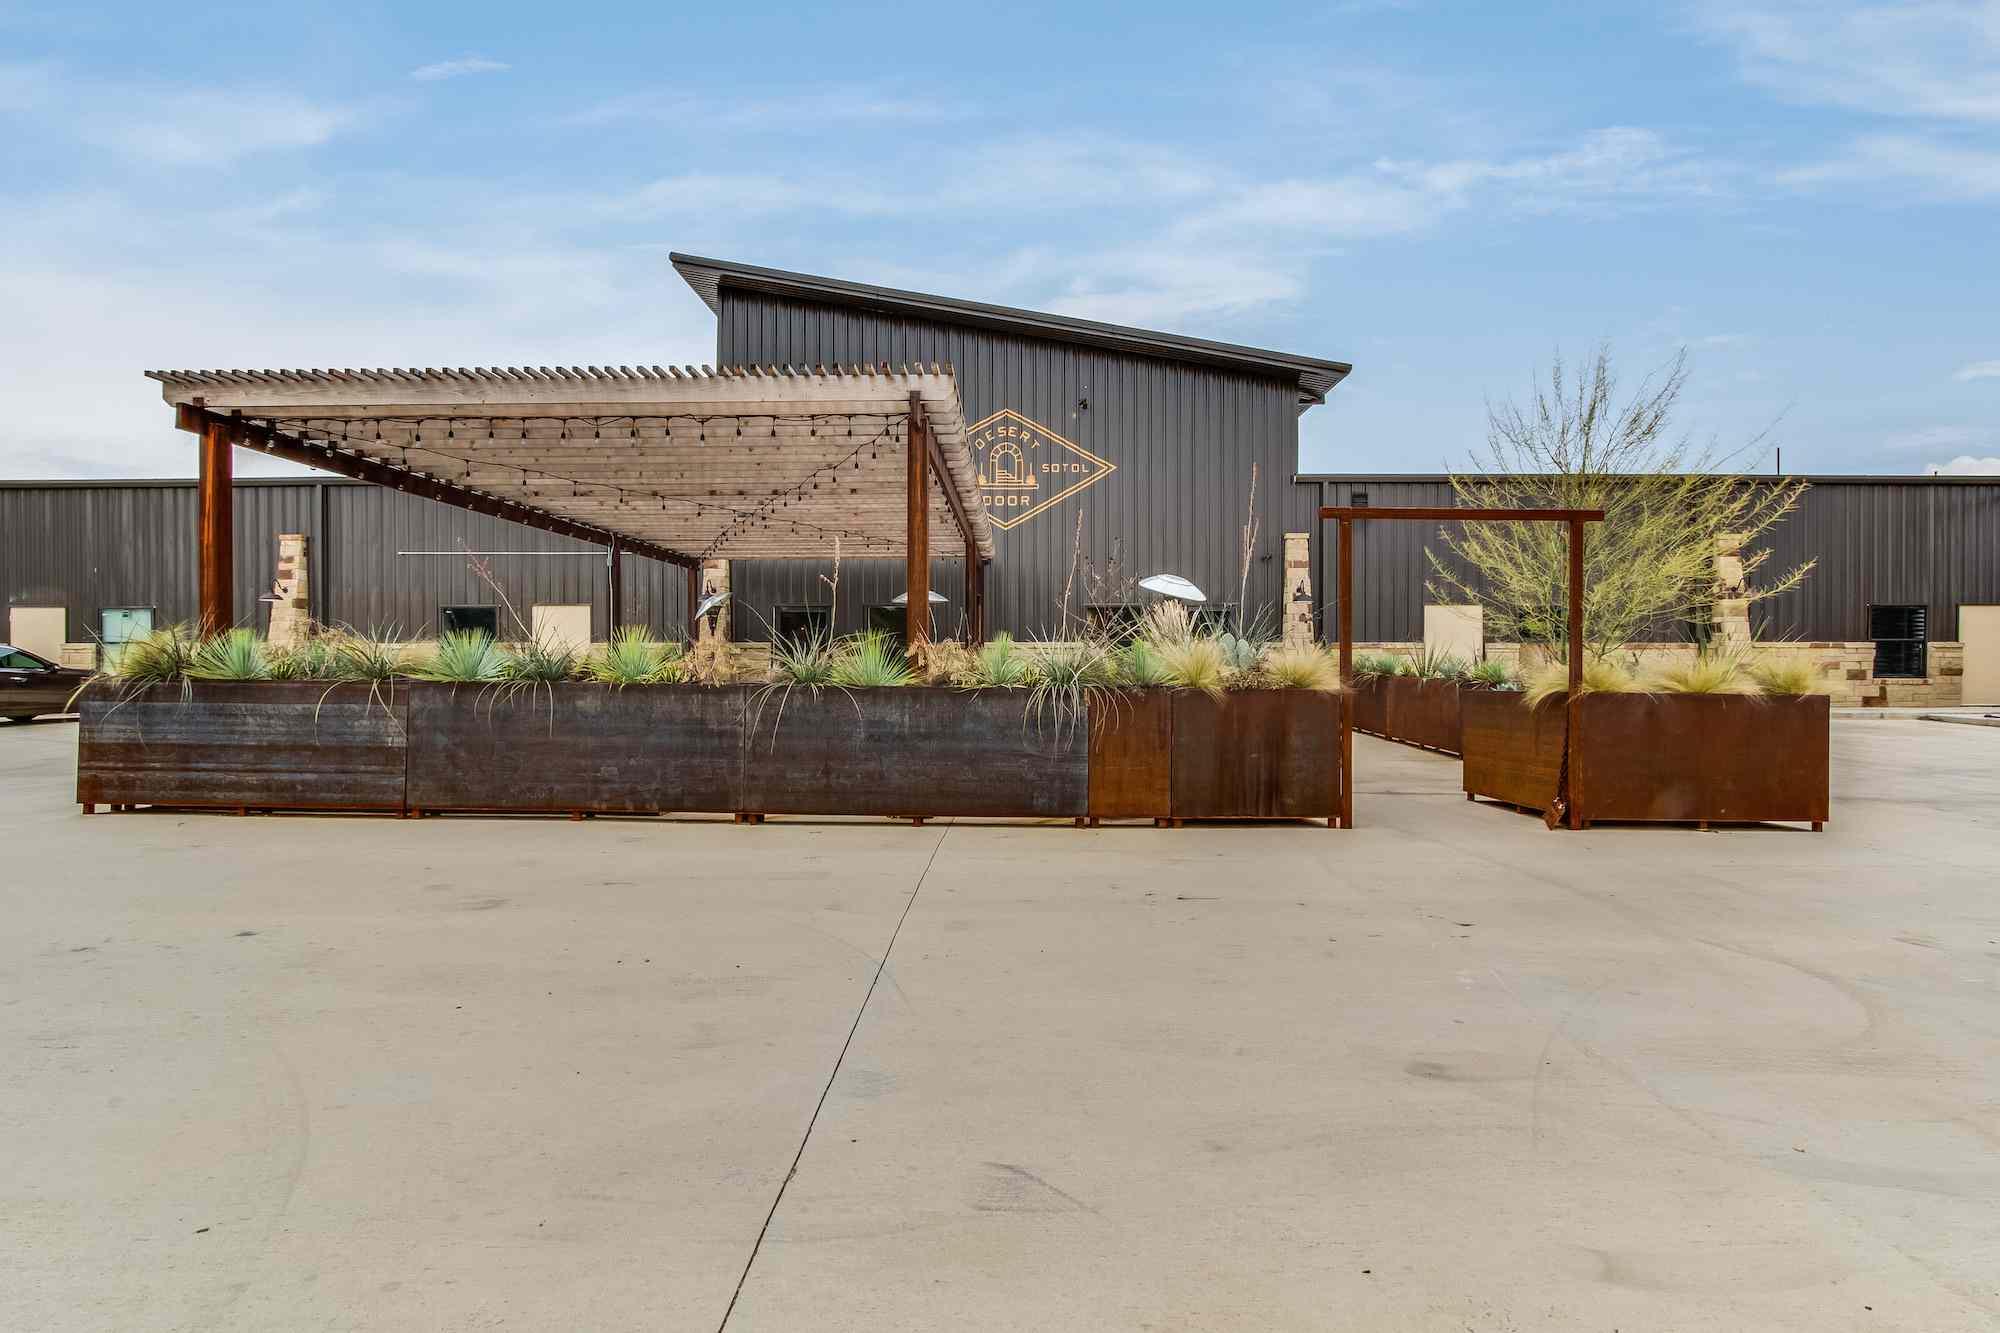 Industrial main building and patio seating at Desert Door Distillery